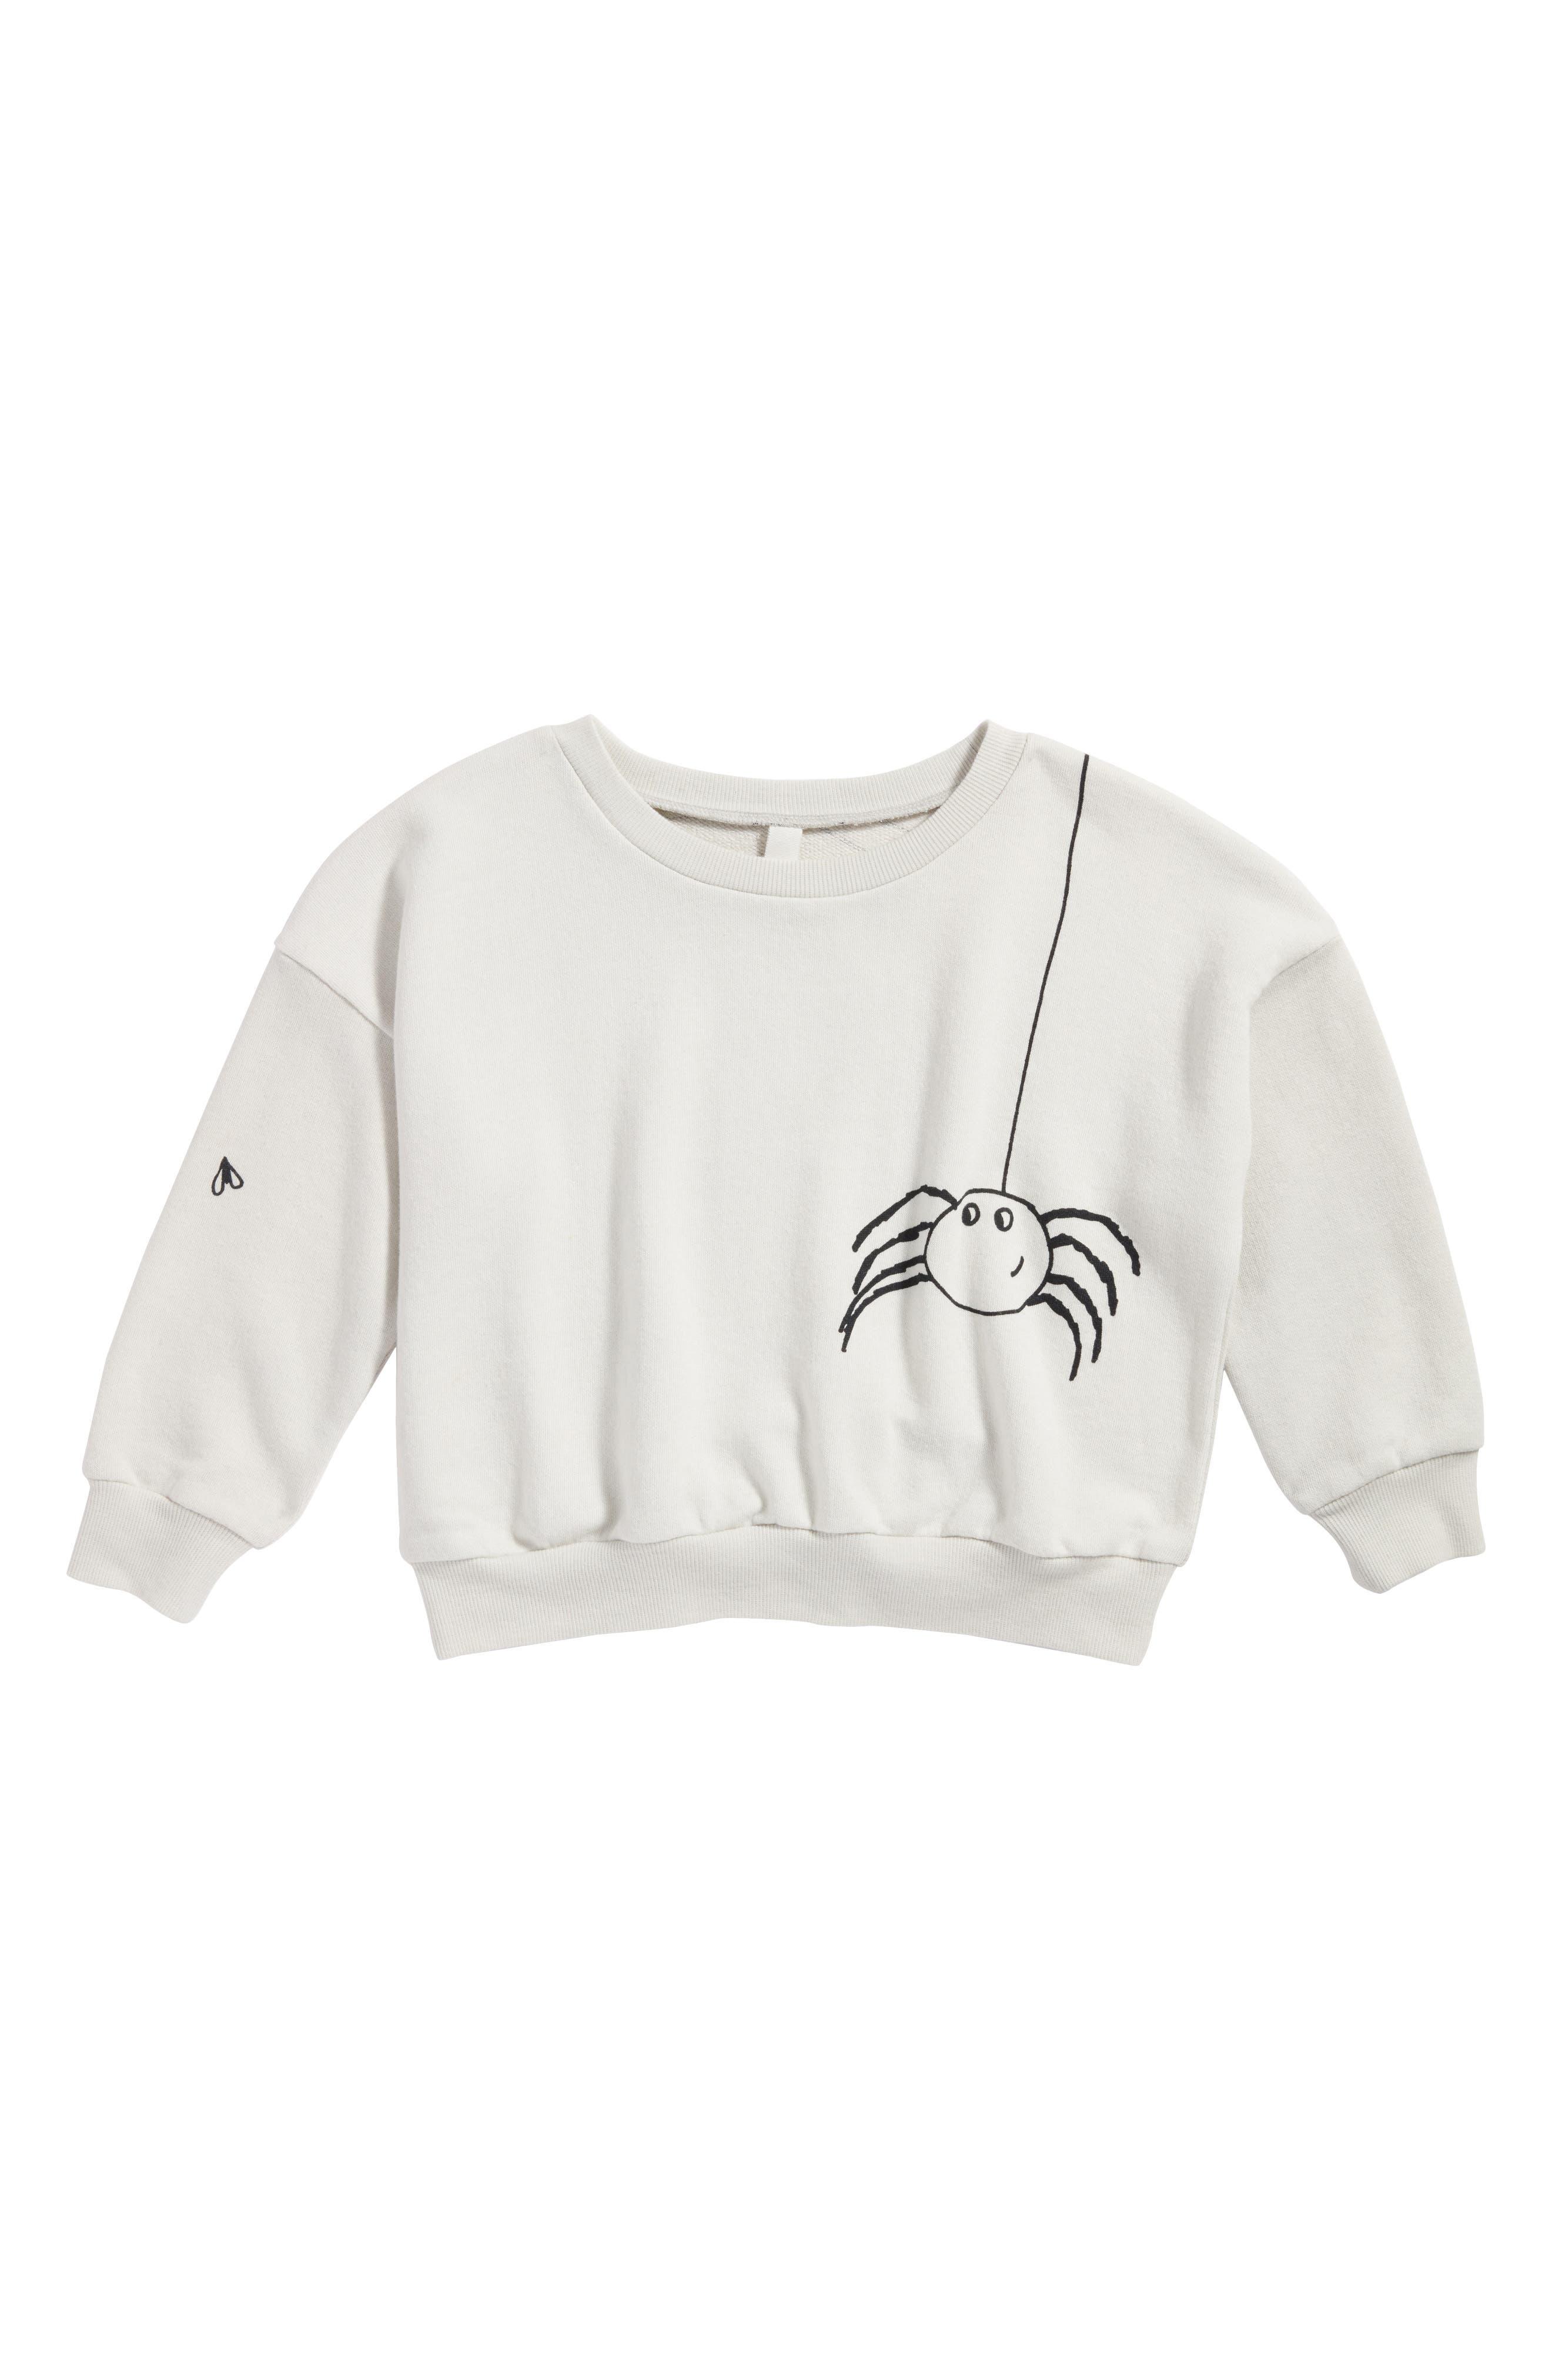 Stem Graphic Sweatshirt (Toddler Boys, Little Boys & Big Boys)